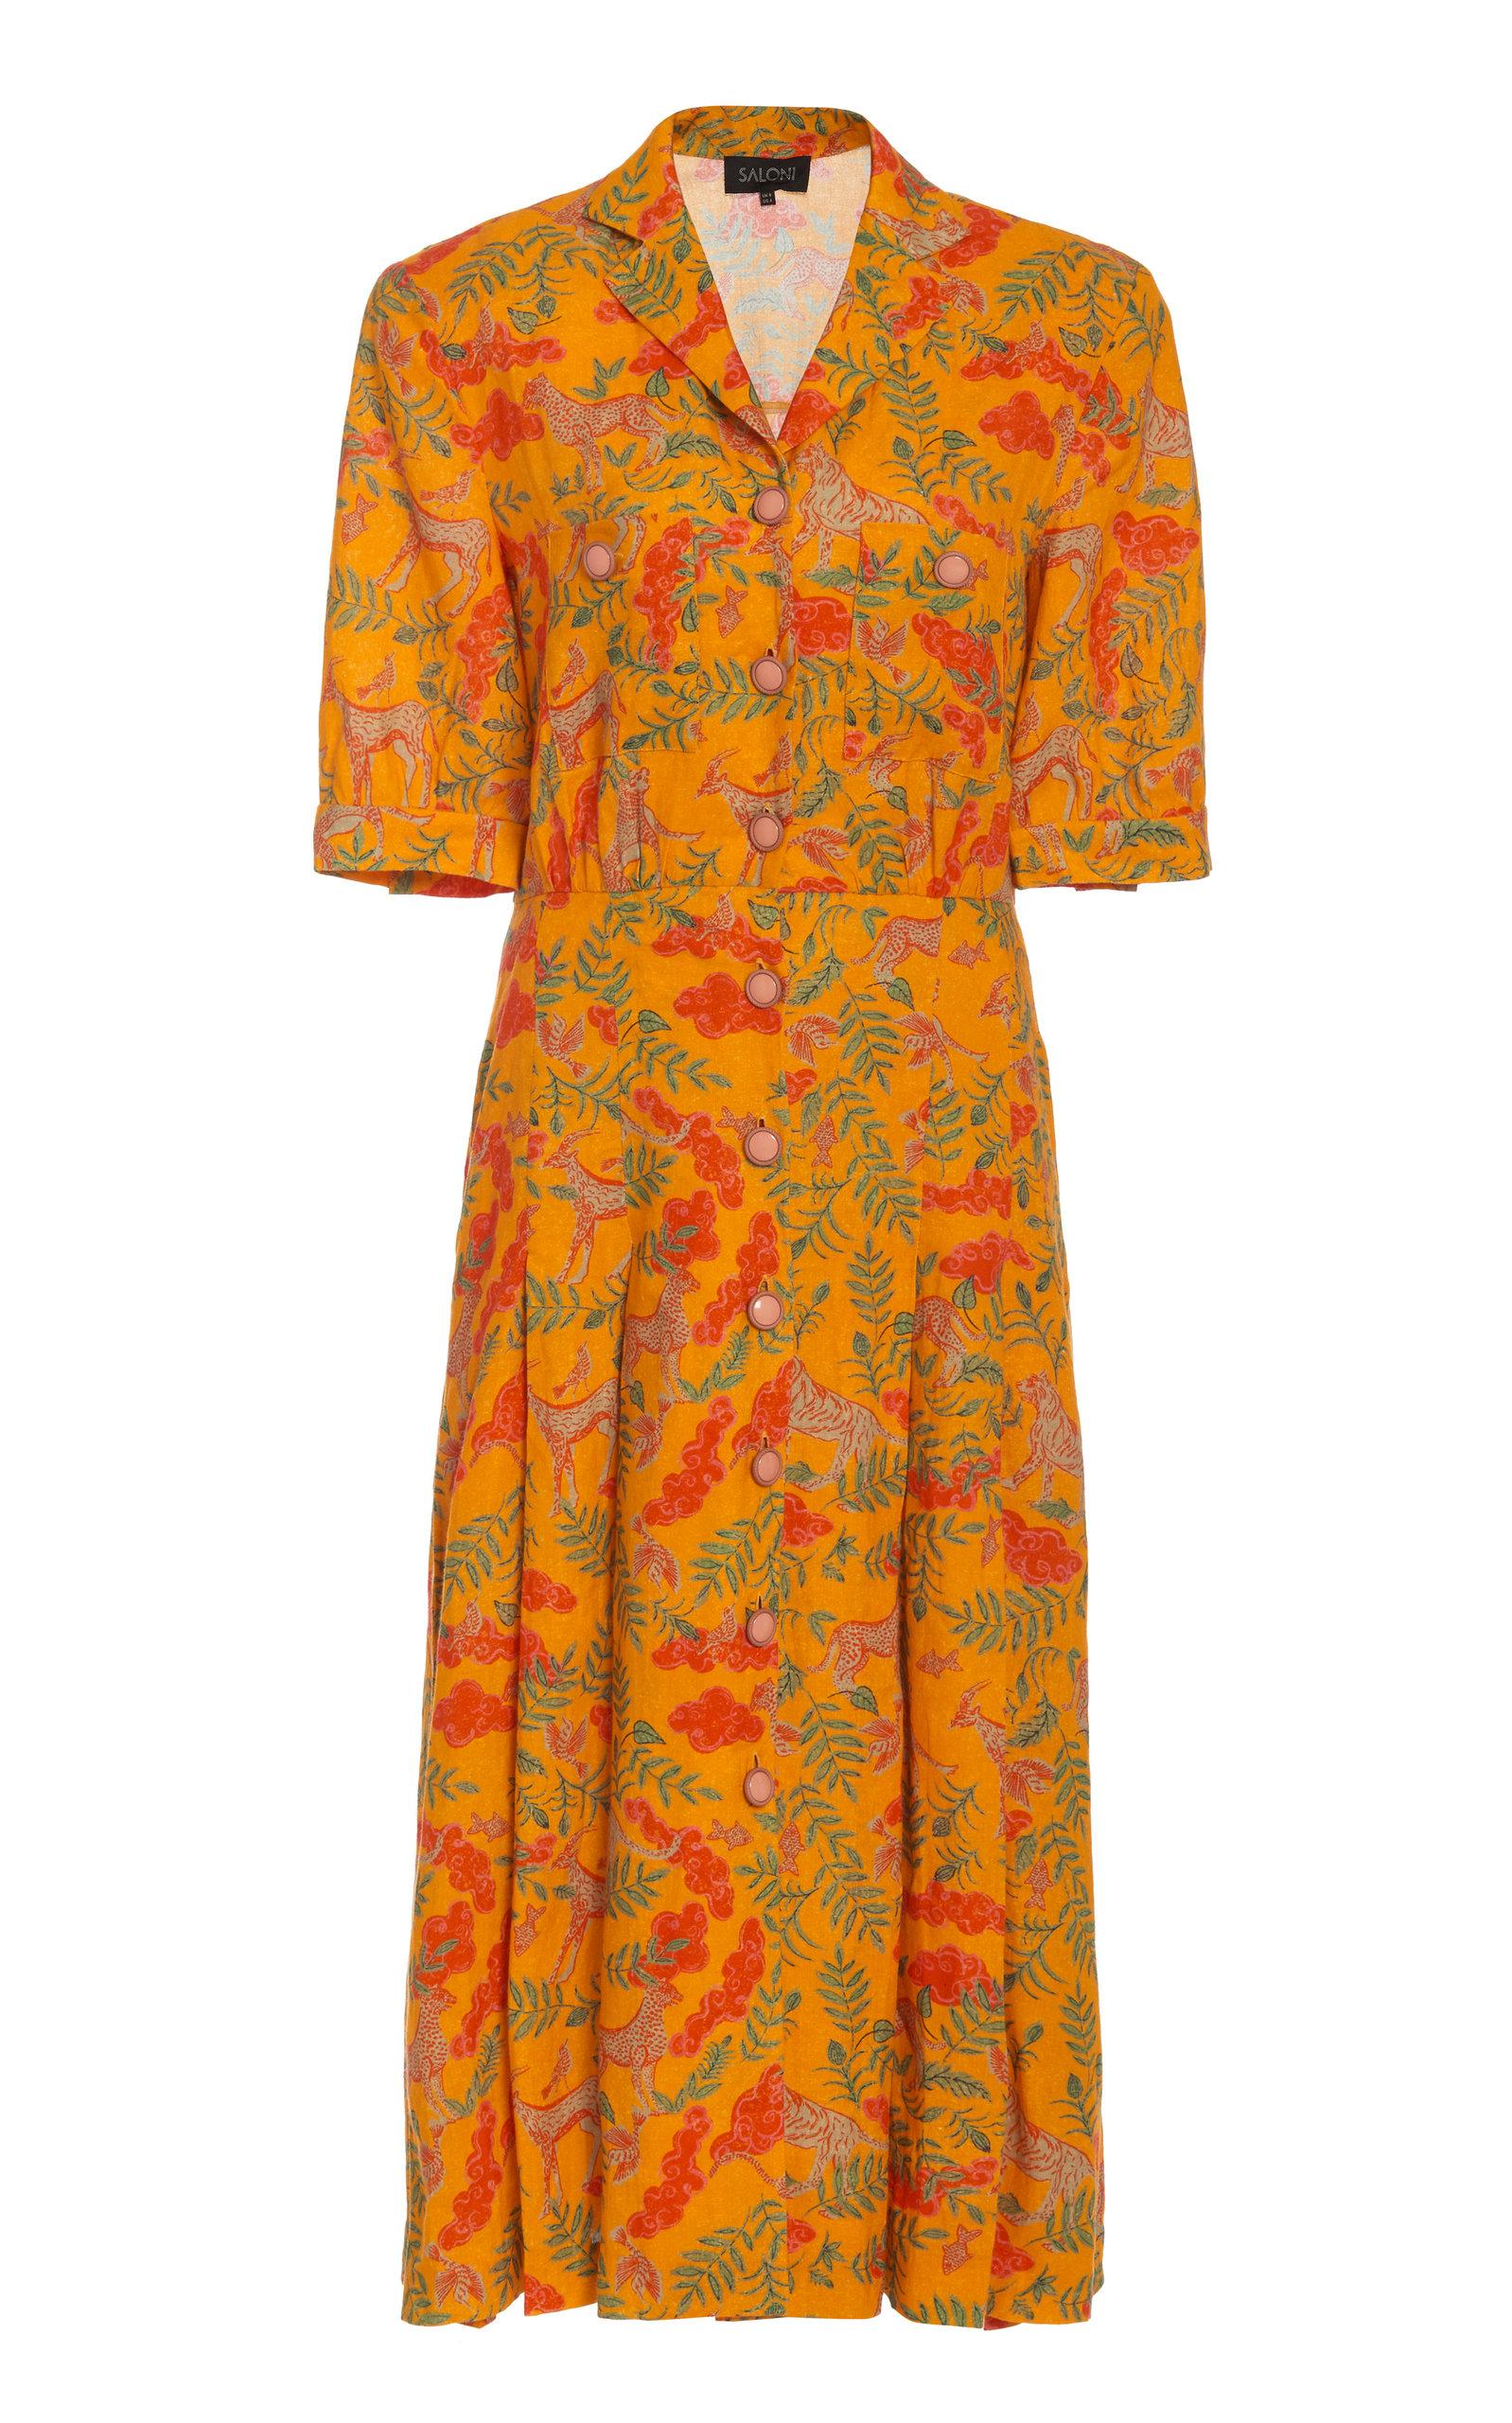 Buy Saloni Eddie Button-Embellished Printed Midi Dress online, shop Saloni at the best price